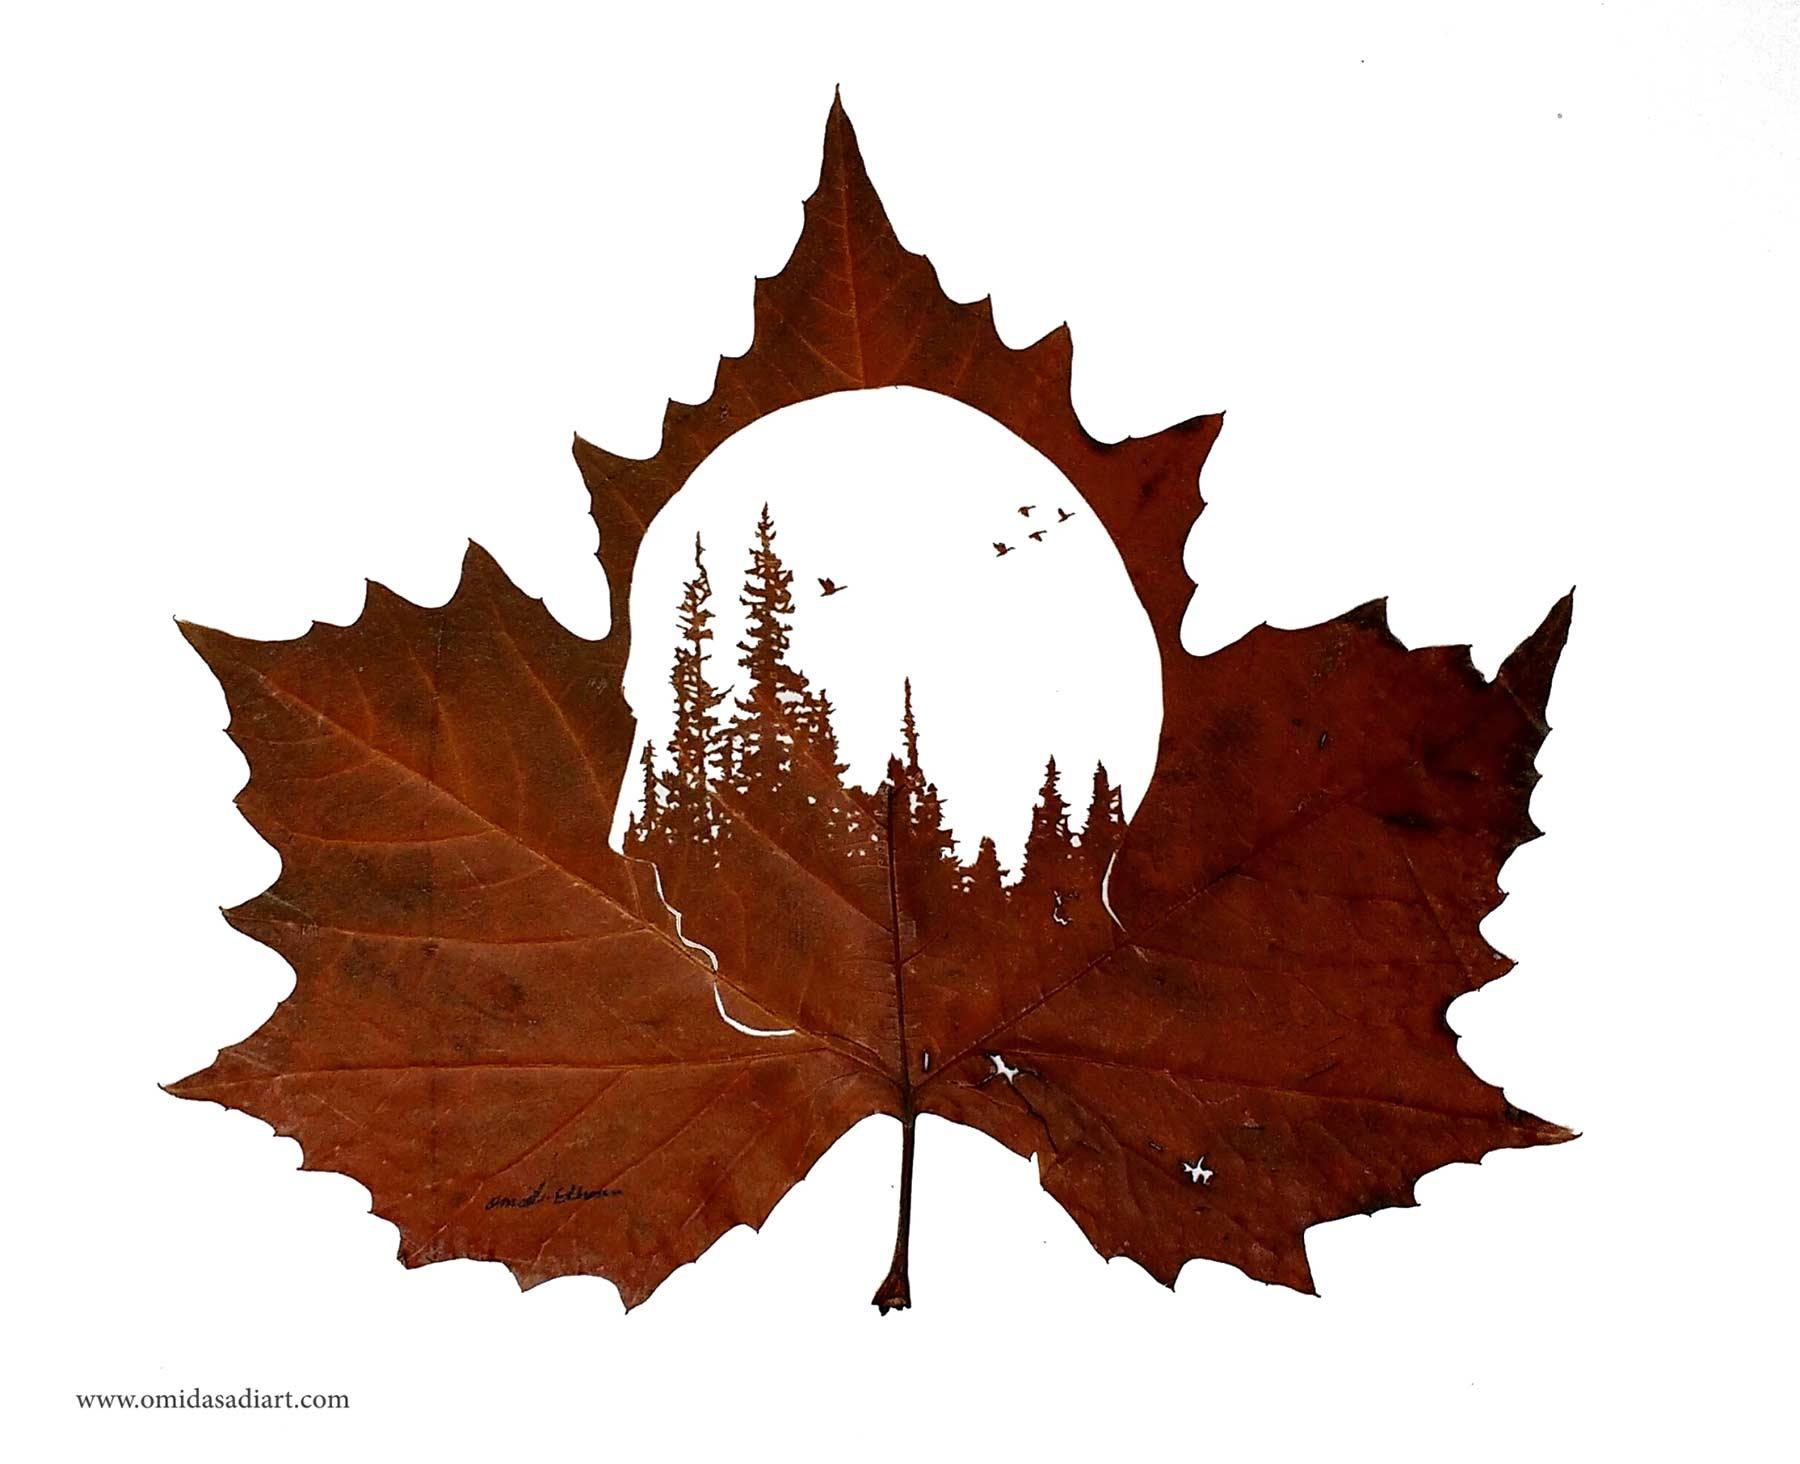 Kunstvoll geschnittene Laubblätter Omid-Asadi-leaf-art_02